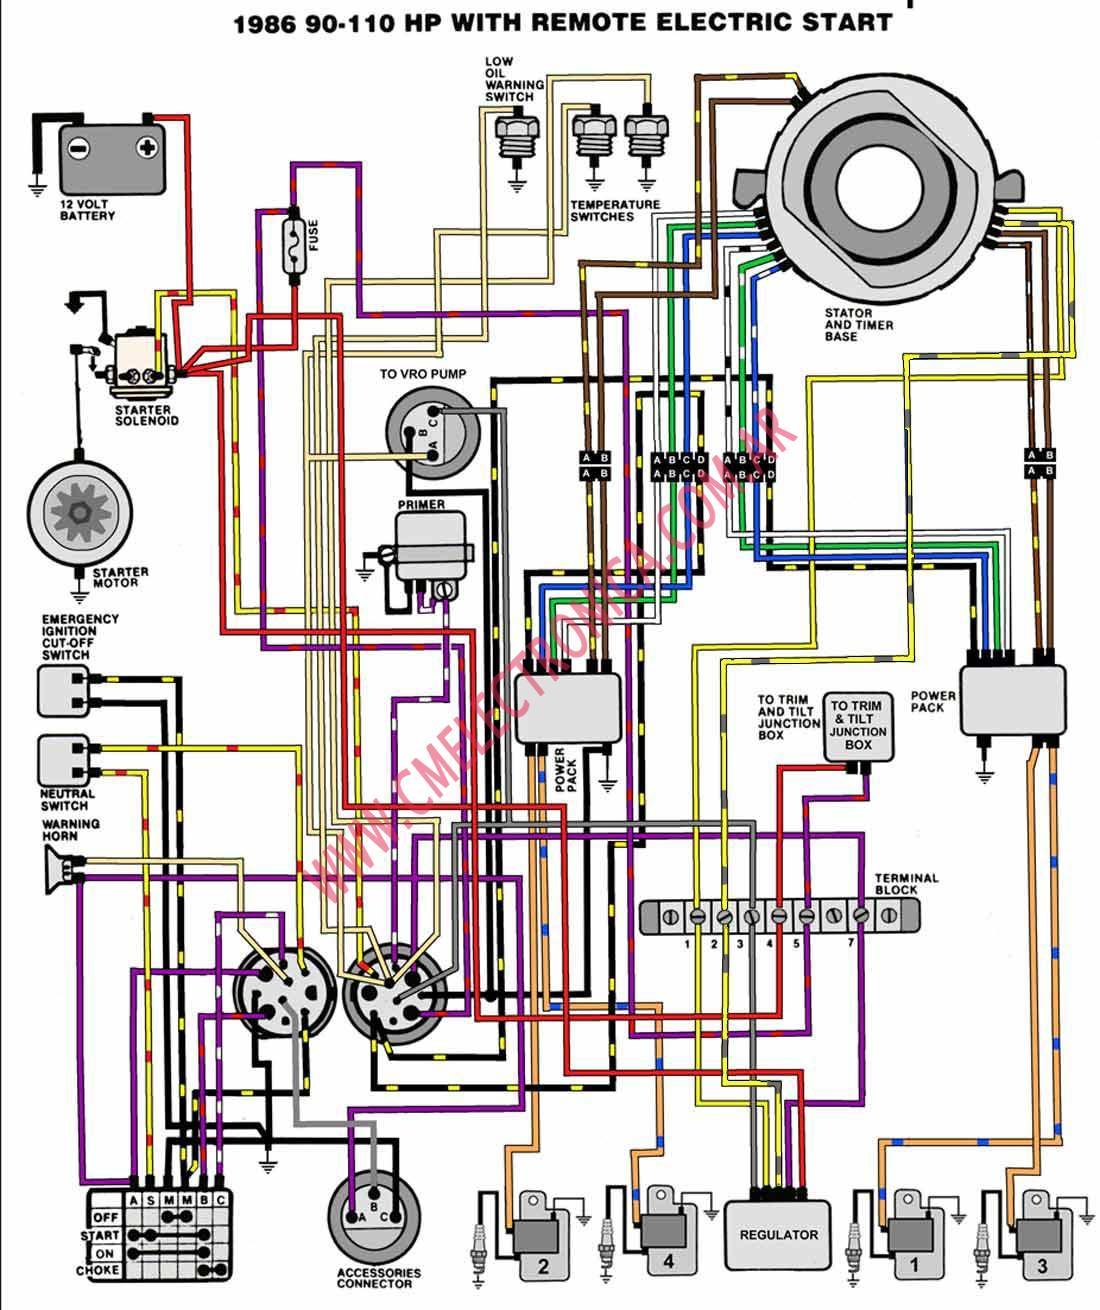 evinrude_johnson 1986_90_115 evinrude wiring diagram facbooik com,50 Hp Mercury Outboard Wiring Diagram Mastertech Marine